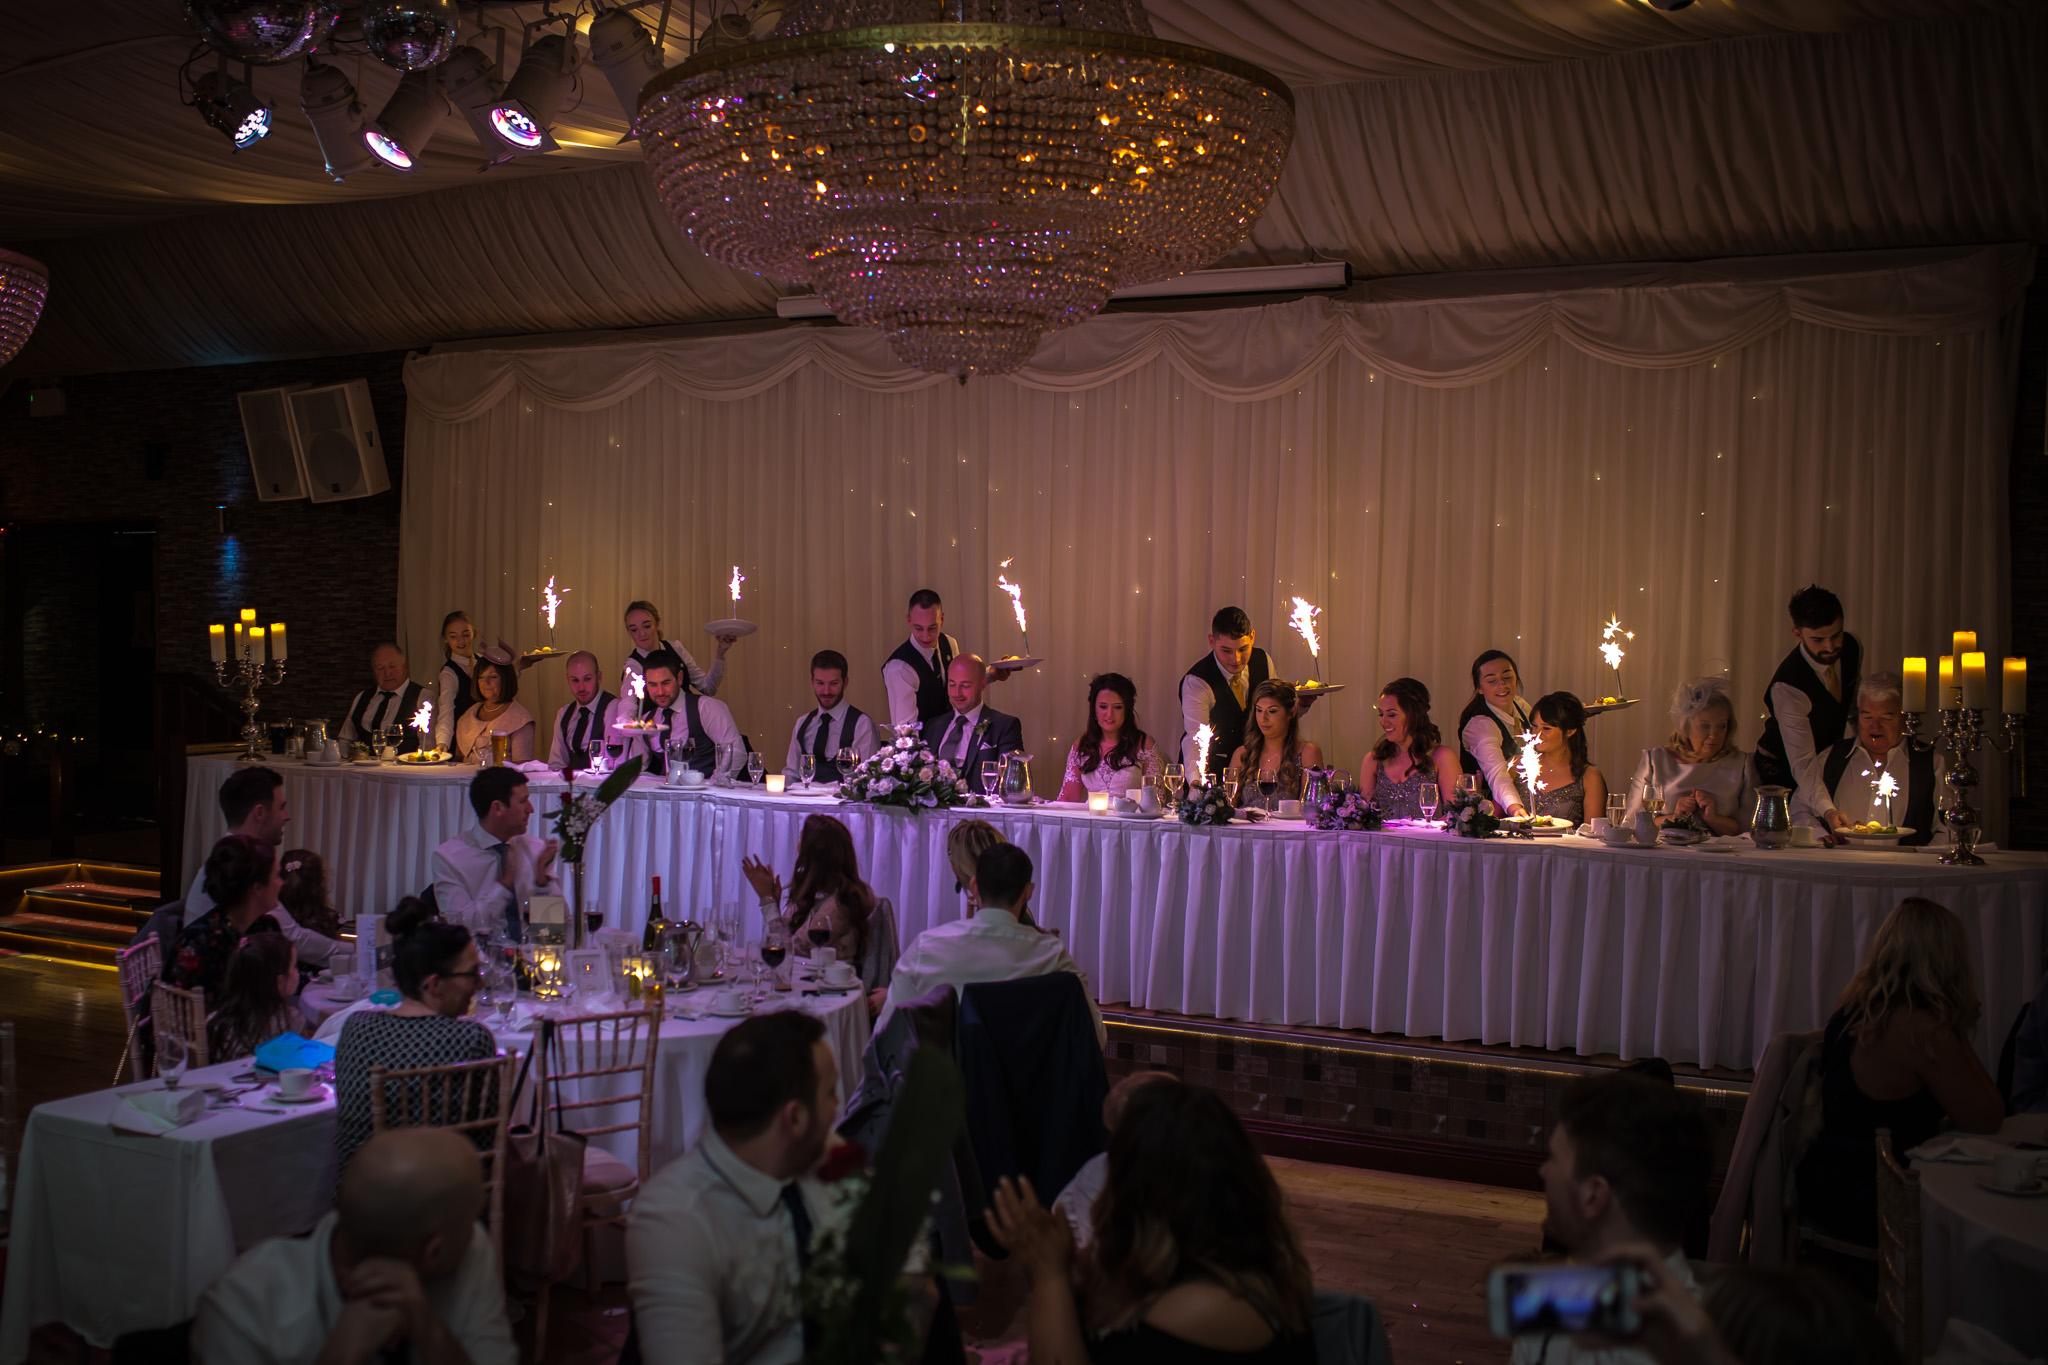 Mark_Barnes_Northern_Ireland_wedding_photographer_Harveys_Point_Donegall_Wedding_photography-Adam&Gemma-57.jpg